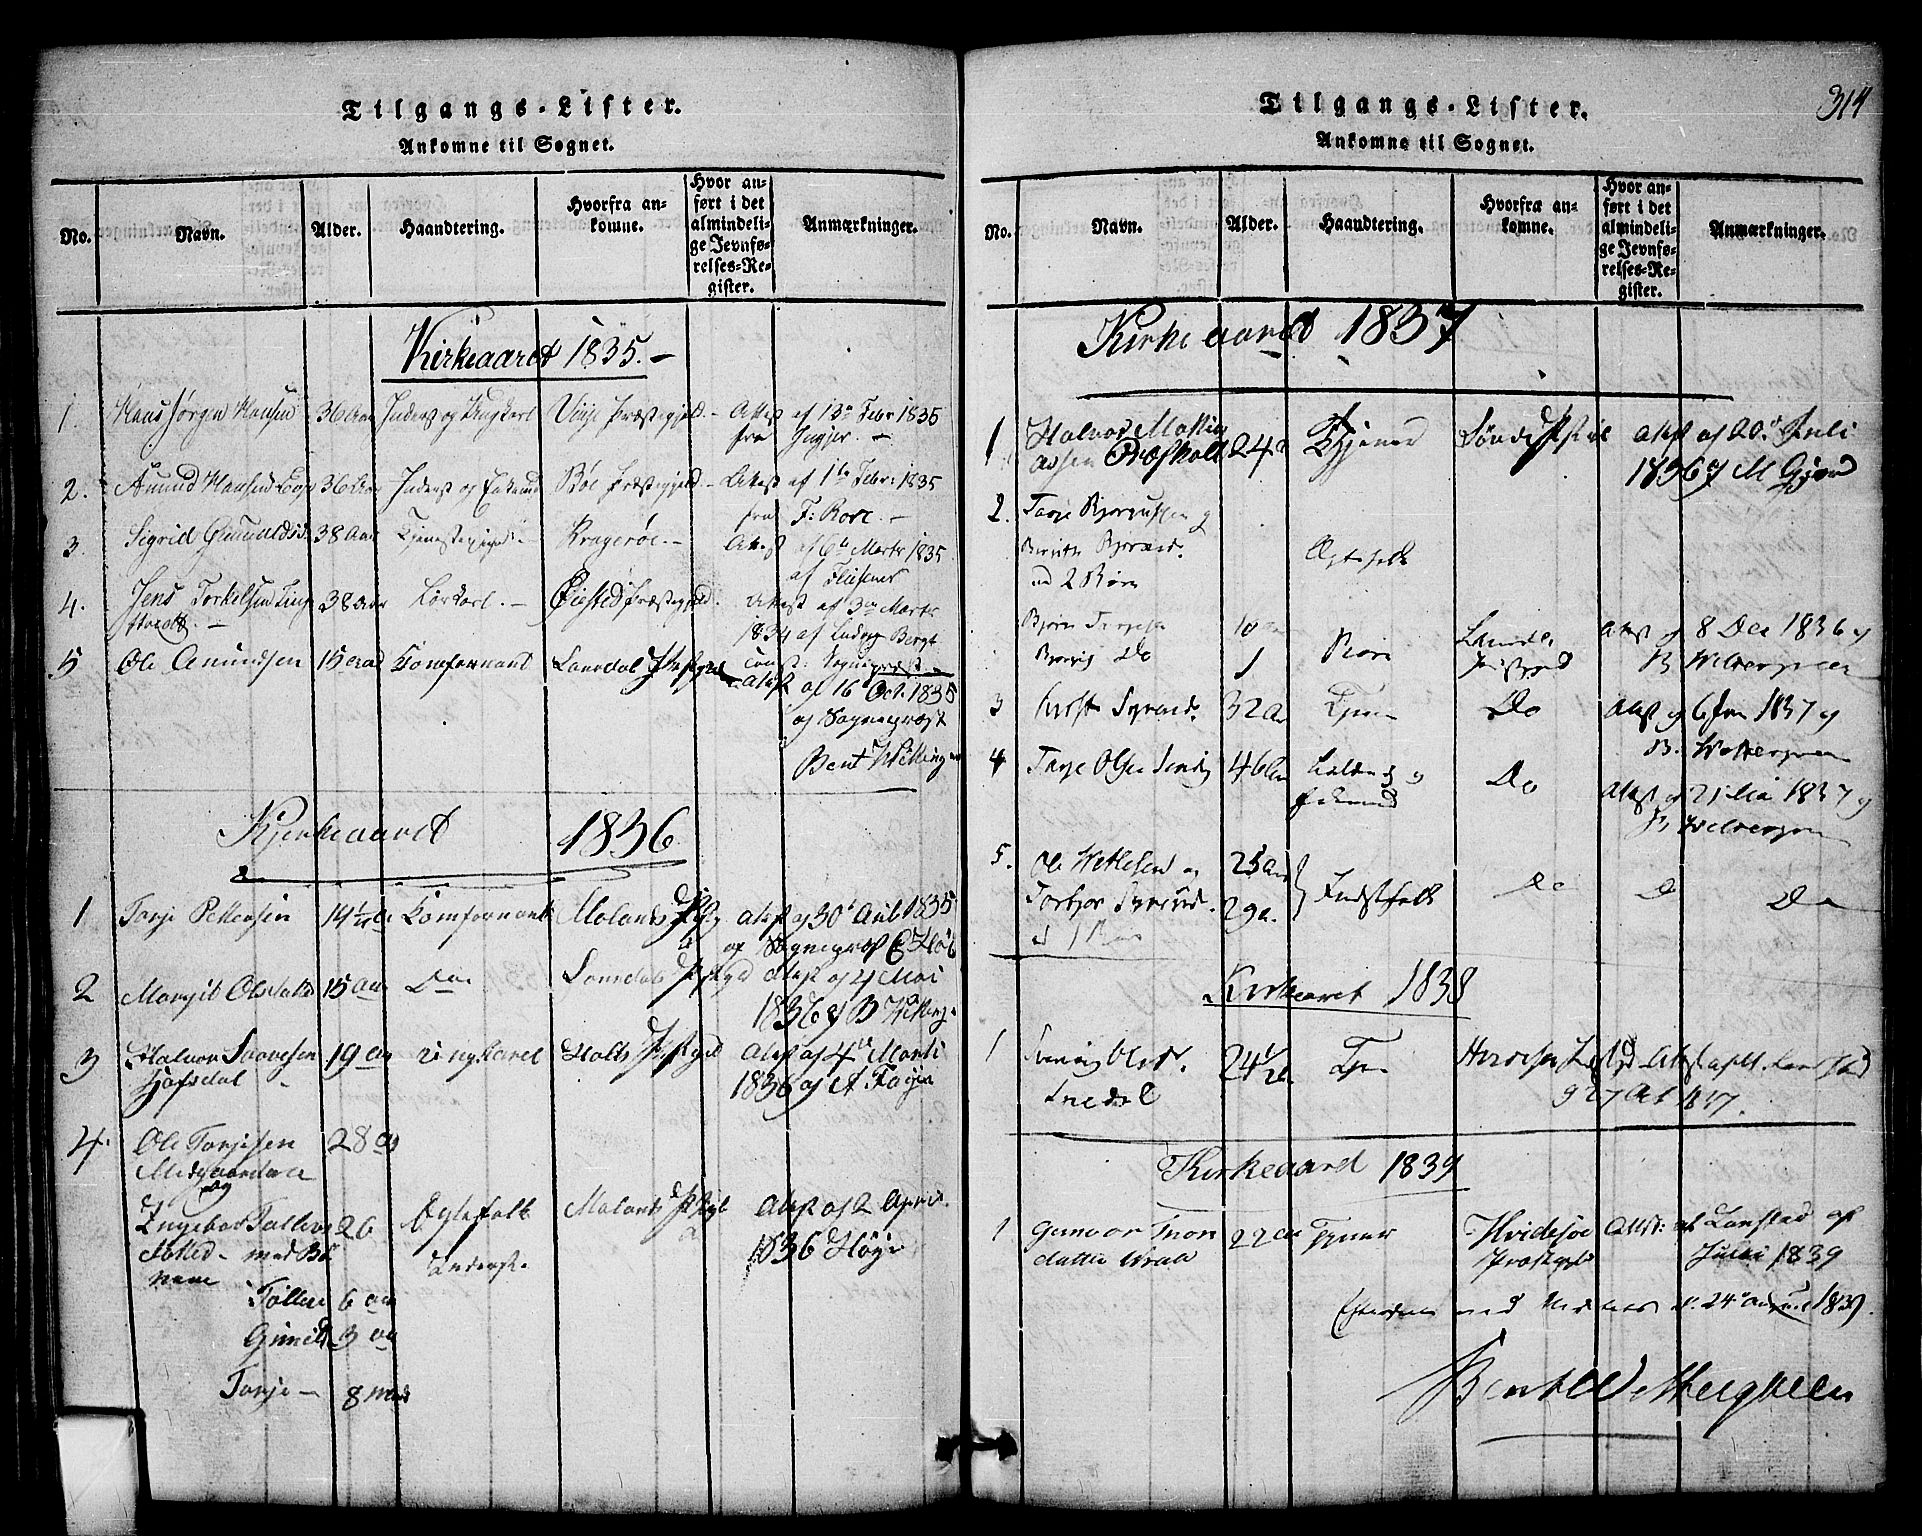 SAKO, Mo kirkebøker, G/Gb/L0001: Klokkerbok nr. II 1, 1814-1843, s. 314